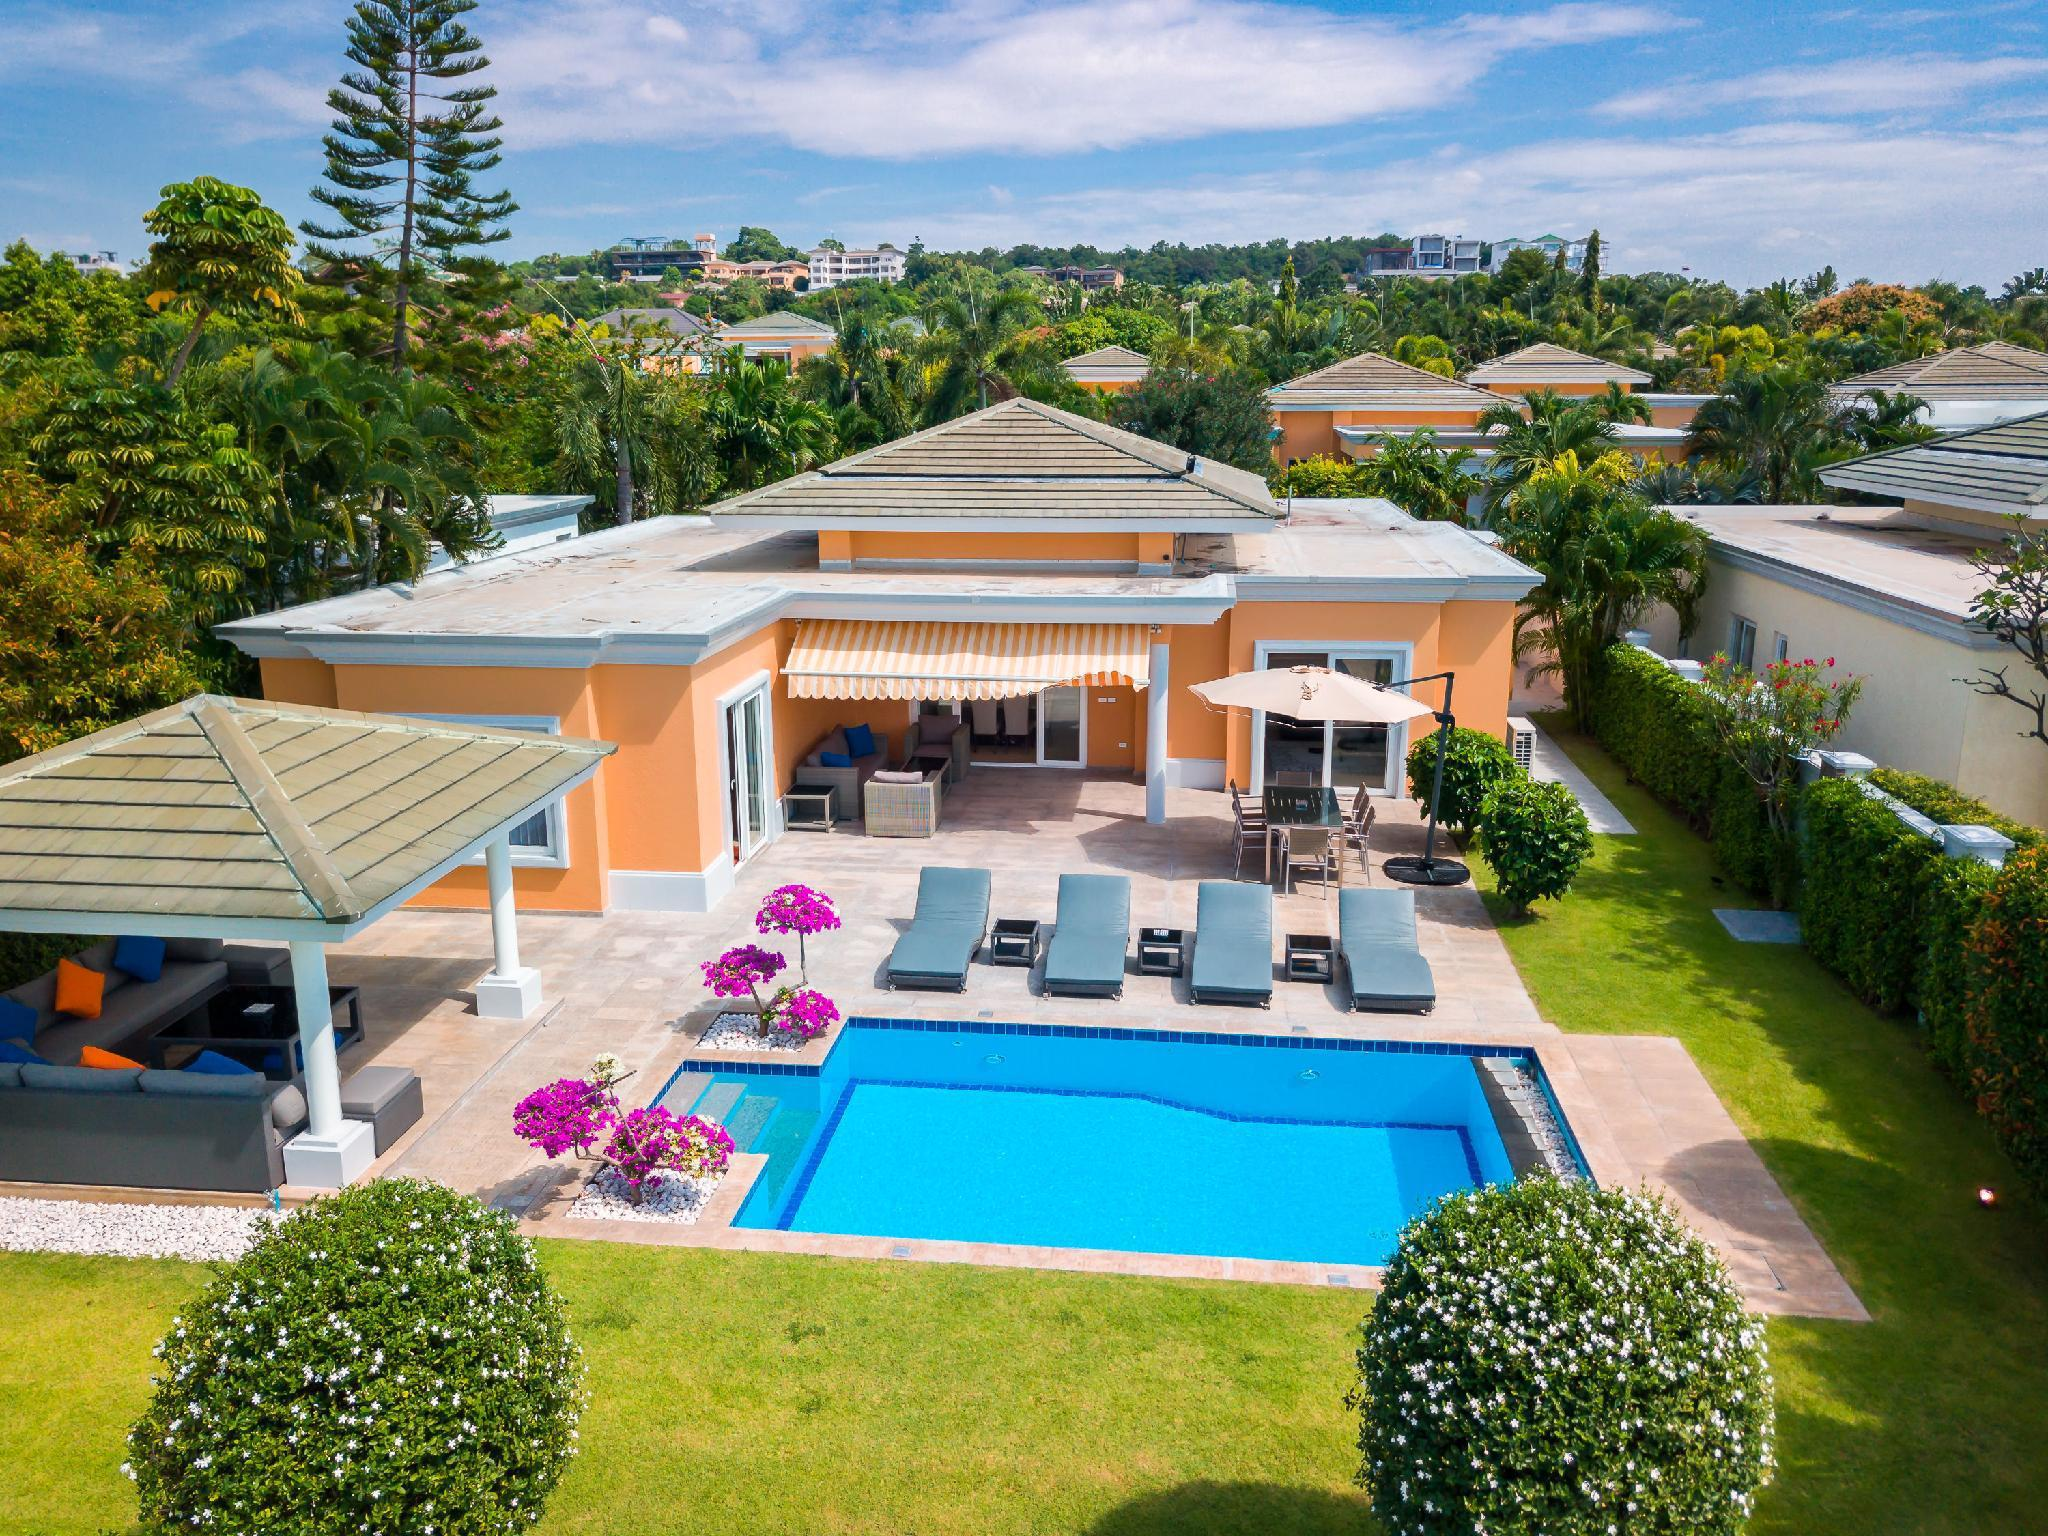 Luxury Pool Villa 604 / 4 BR 8-10 Persons Luxury Pool Villa 604 / 4 BR 8-10 Persons